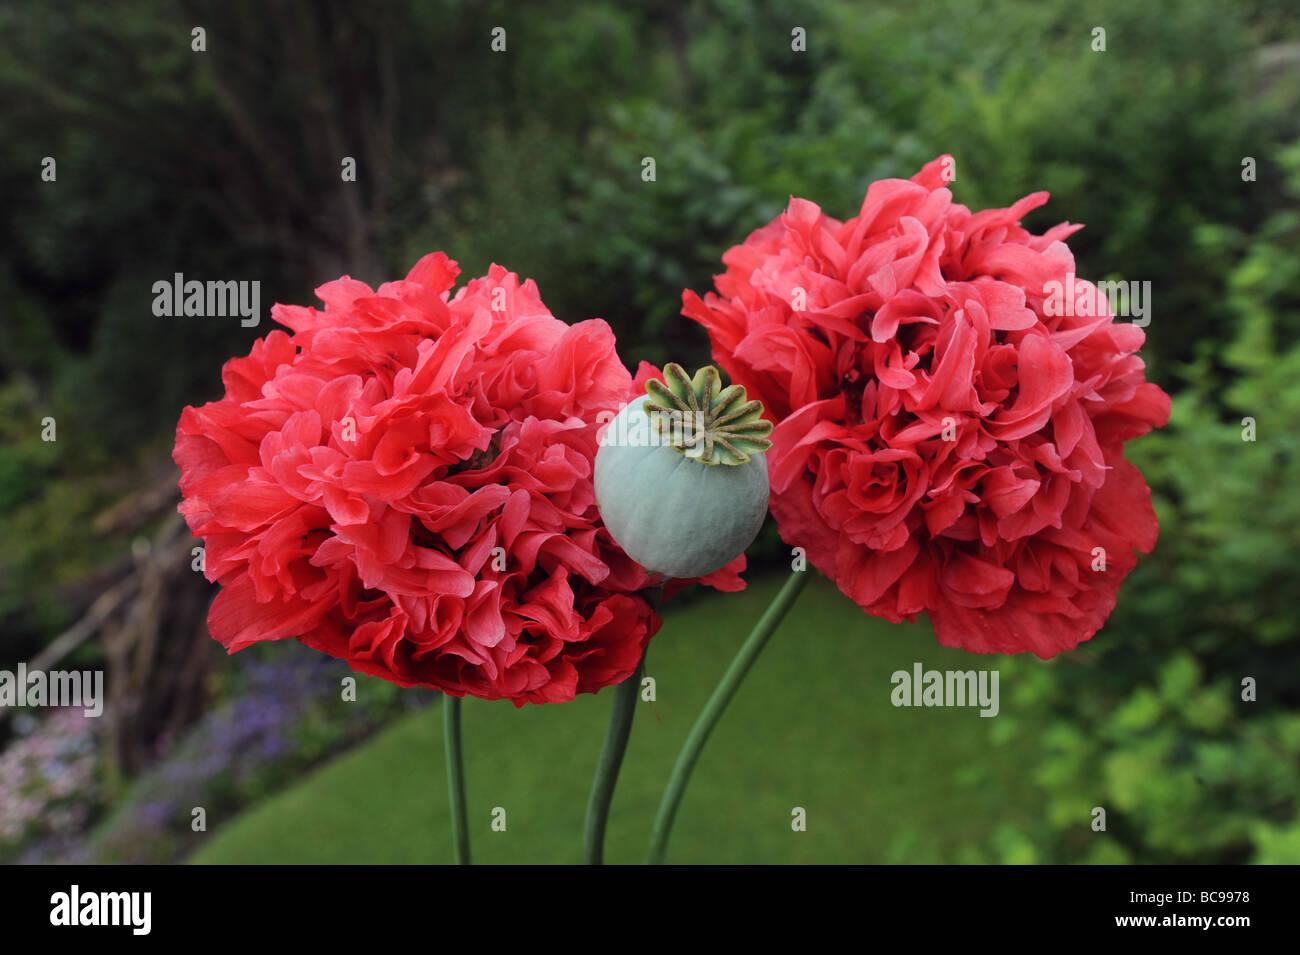 Opium Poppy Flower Seed Head Stock Photos Opium Poppy Flower Seed